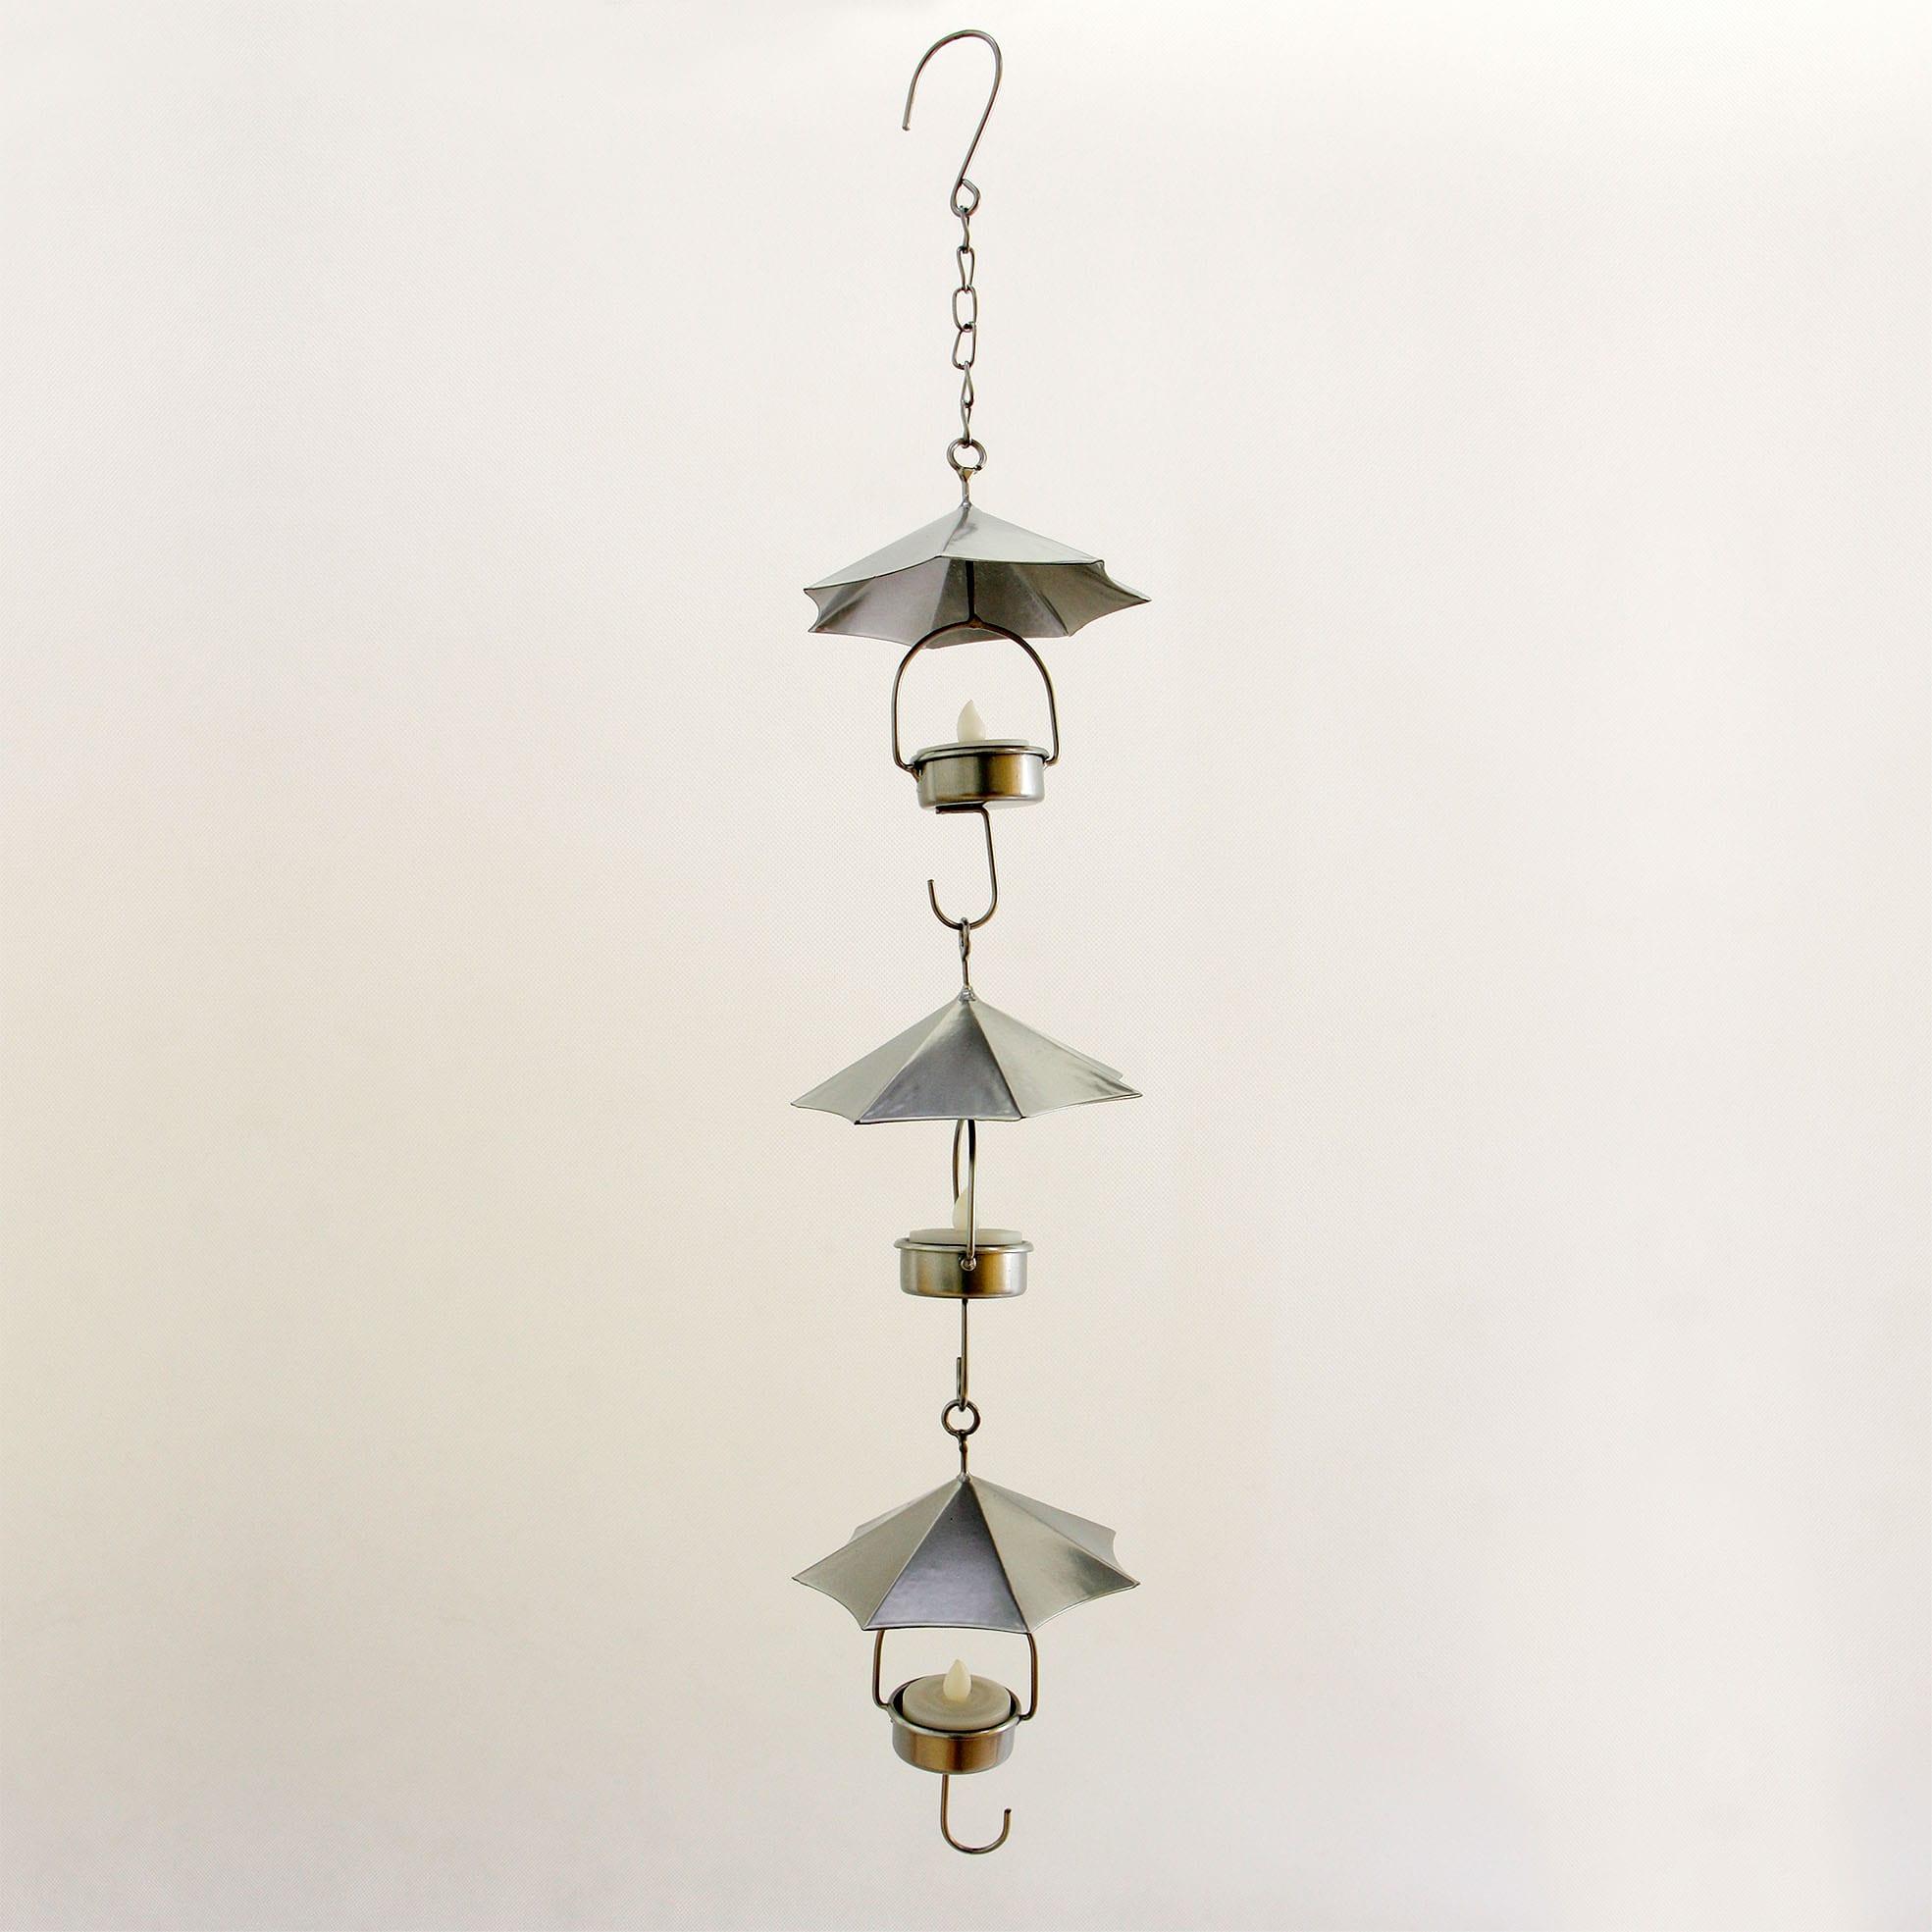 Prepainted Sheet Landscape Lighting - Hanging LED Tea Light Holder  MYHH05016 – Zhongxin